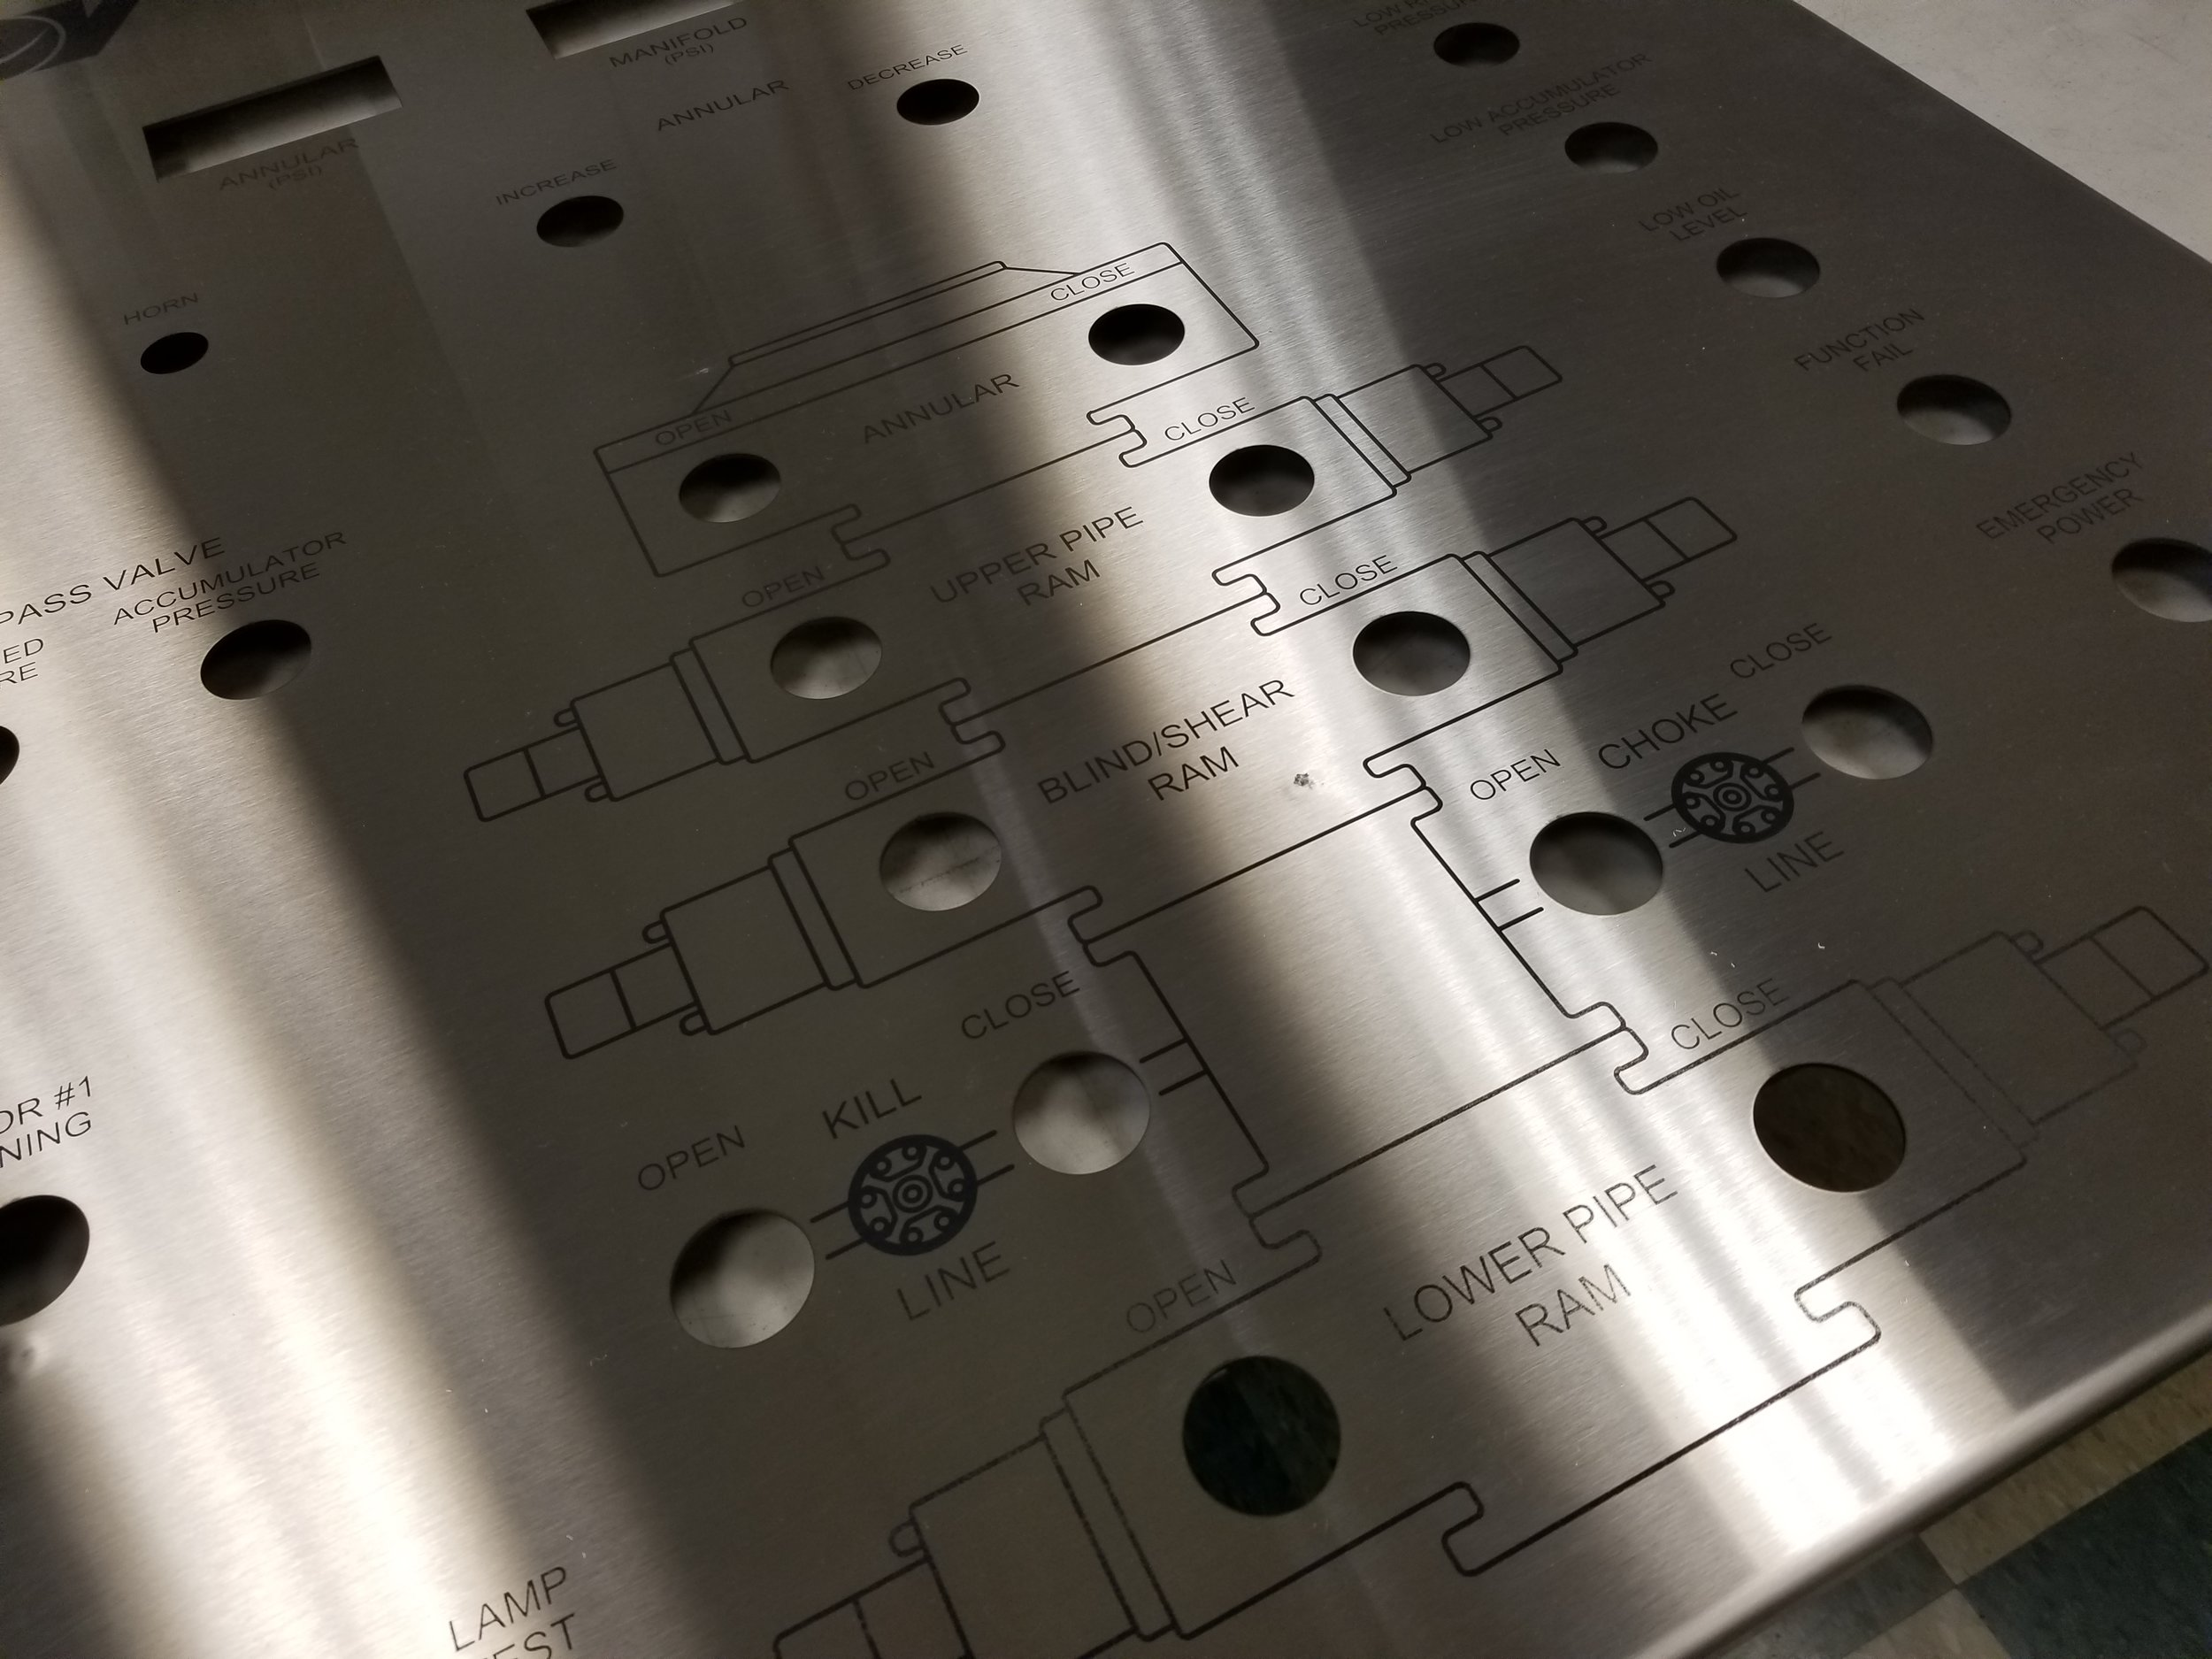 Enclosure Engraving - Custom Enclosure Engraving - Industrial Enclosure Engraving - Industrial Enclosure Fabrication - Engrave It Houston